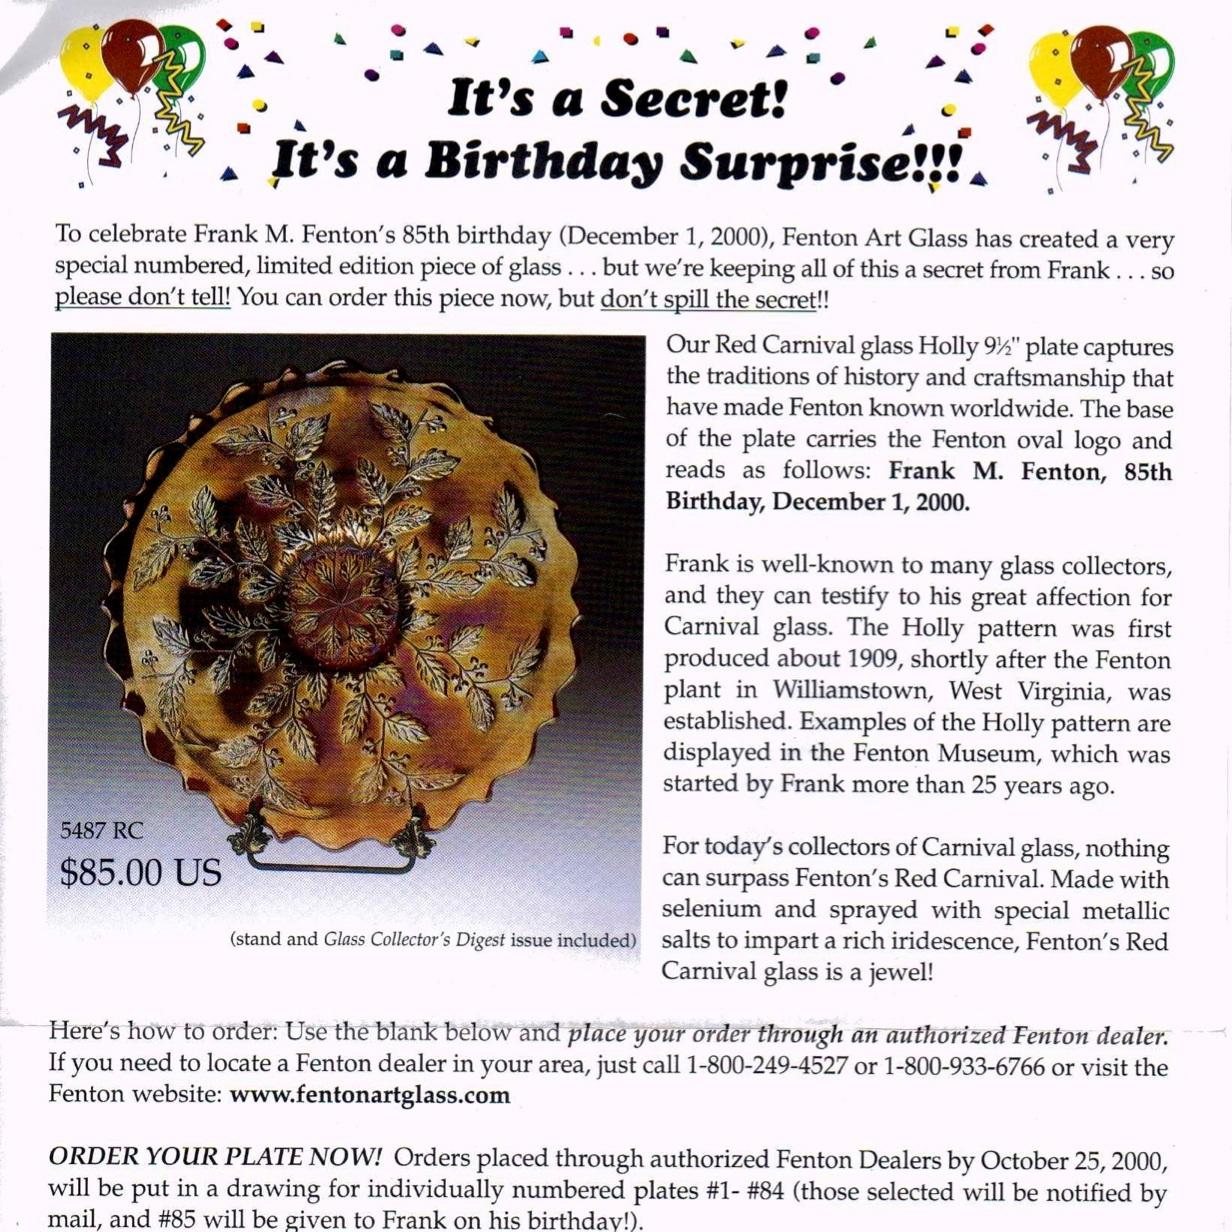 2000 Birthday Surprise Flyer